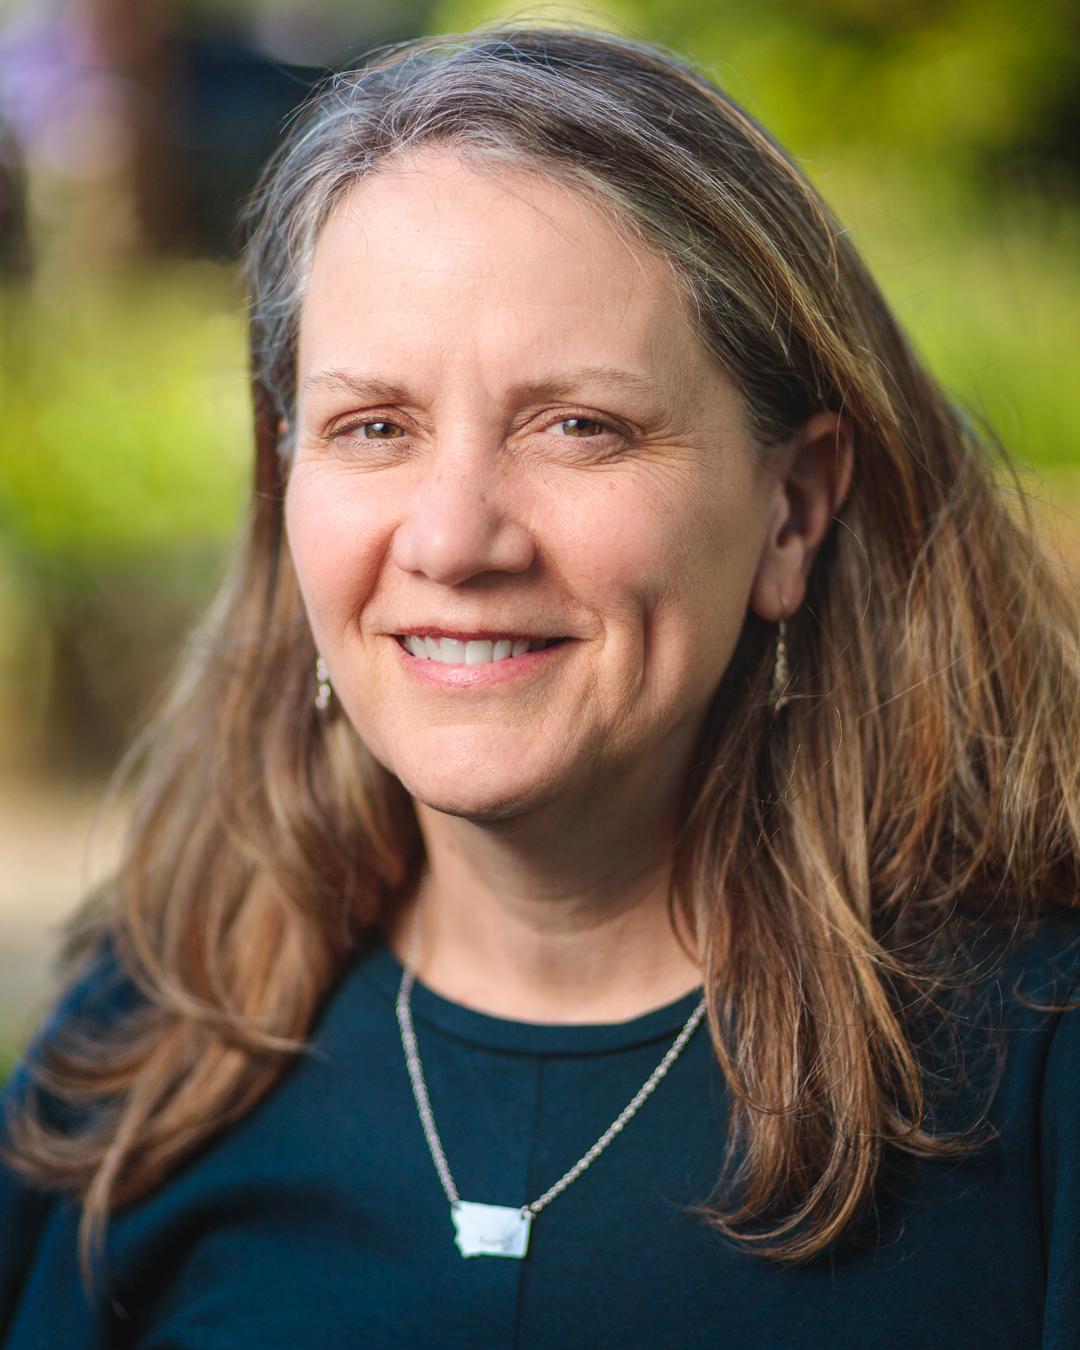 Wendy Blain, Director of Finance